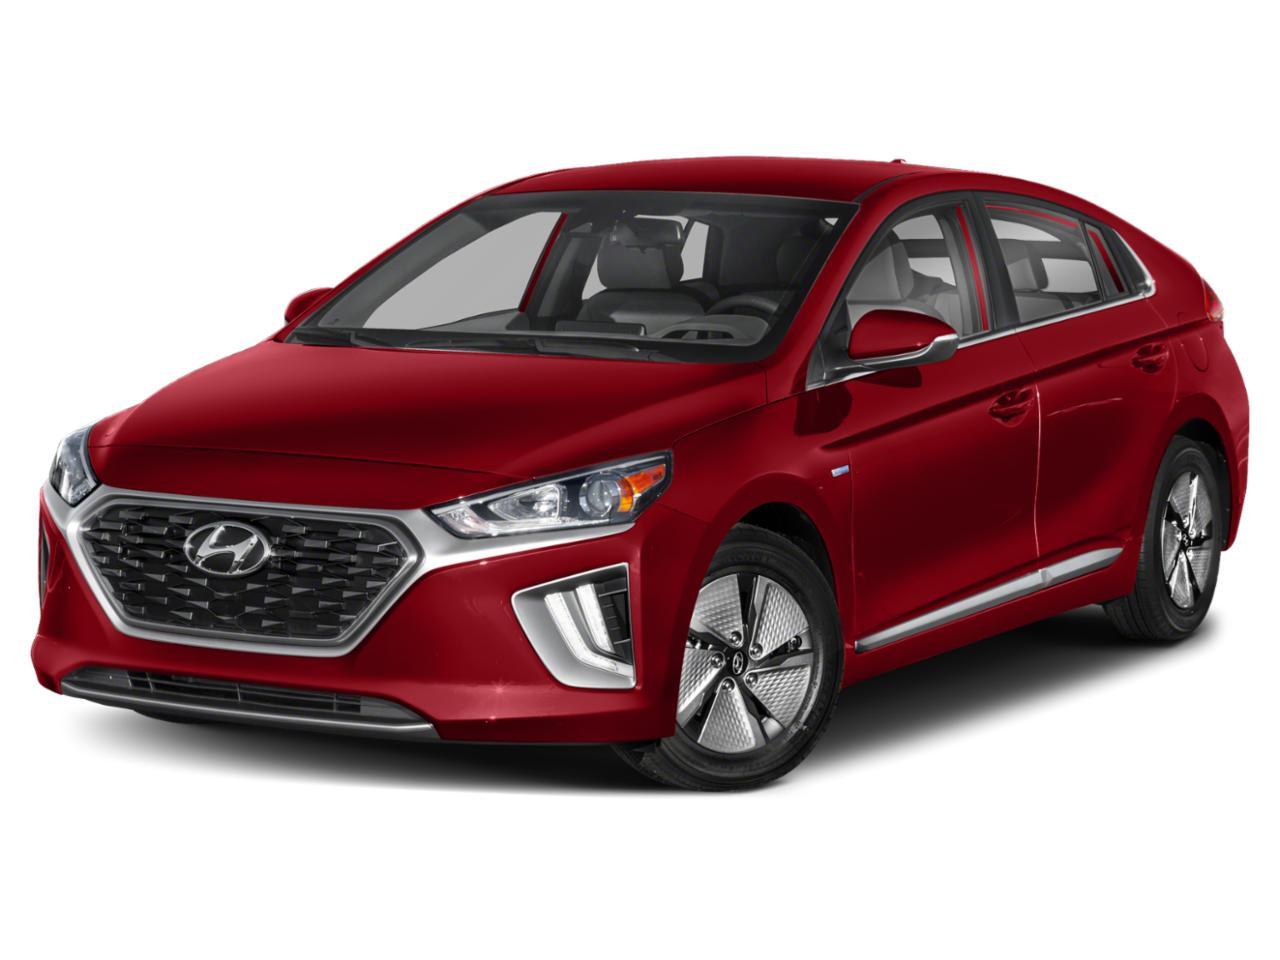 2020 Hyundai IONIQ Hybrid Vehicle Photo in Odessa, TX 79762